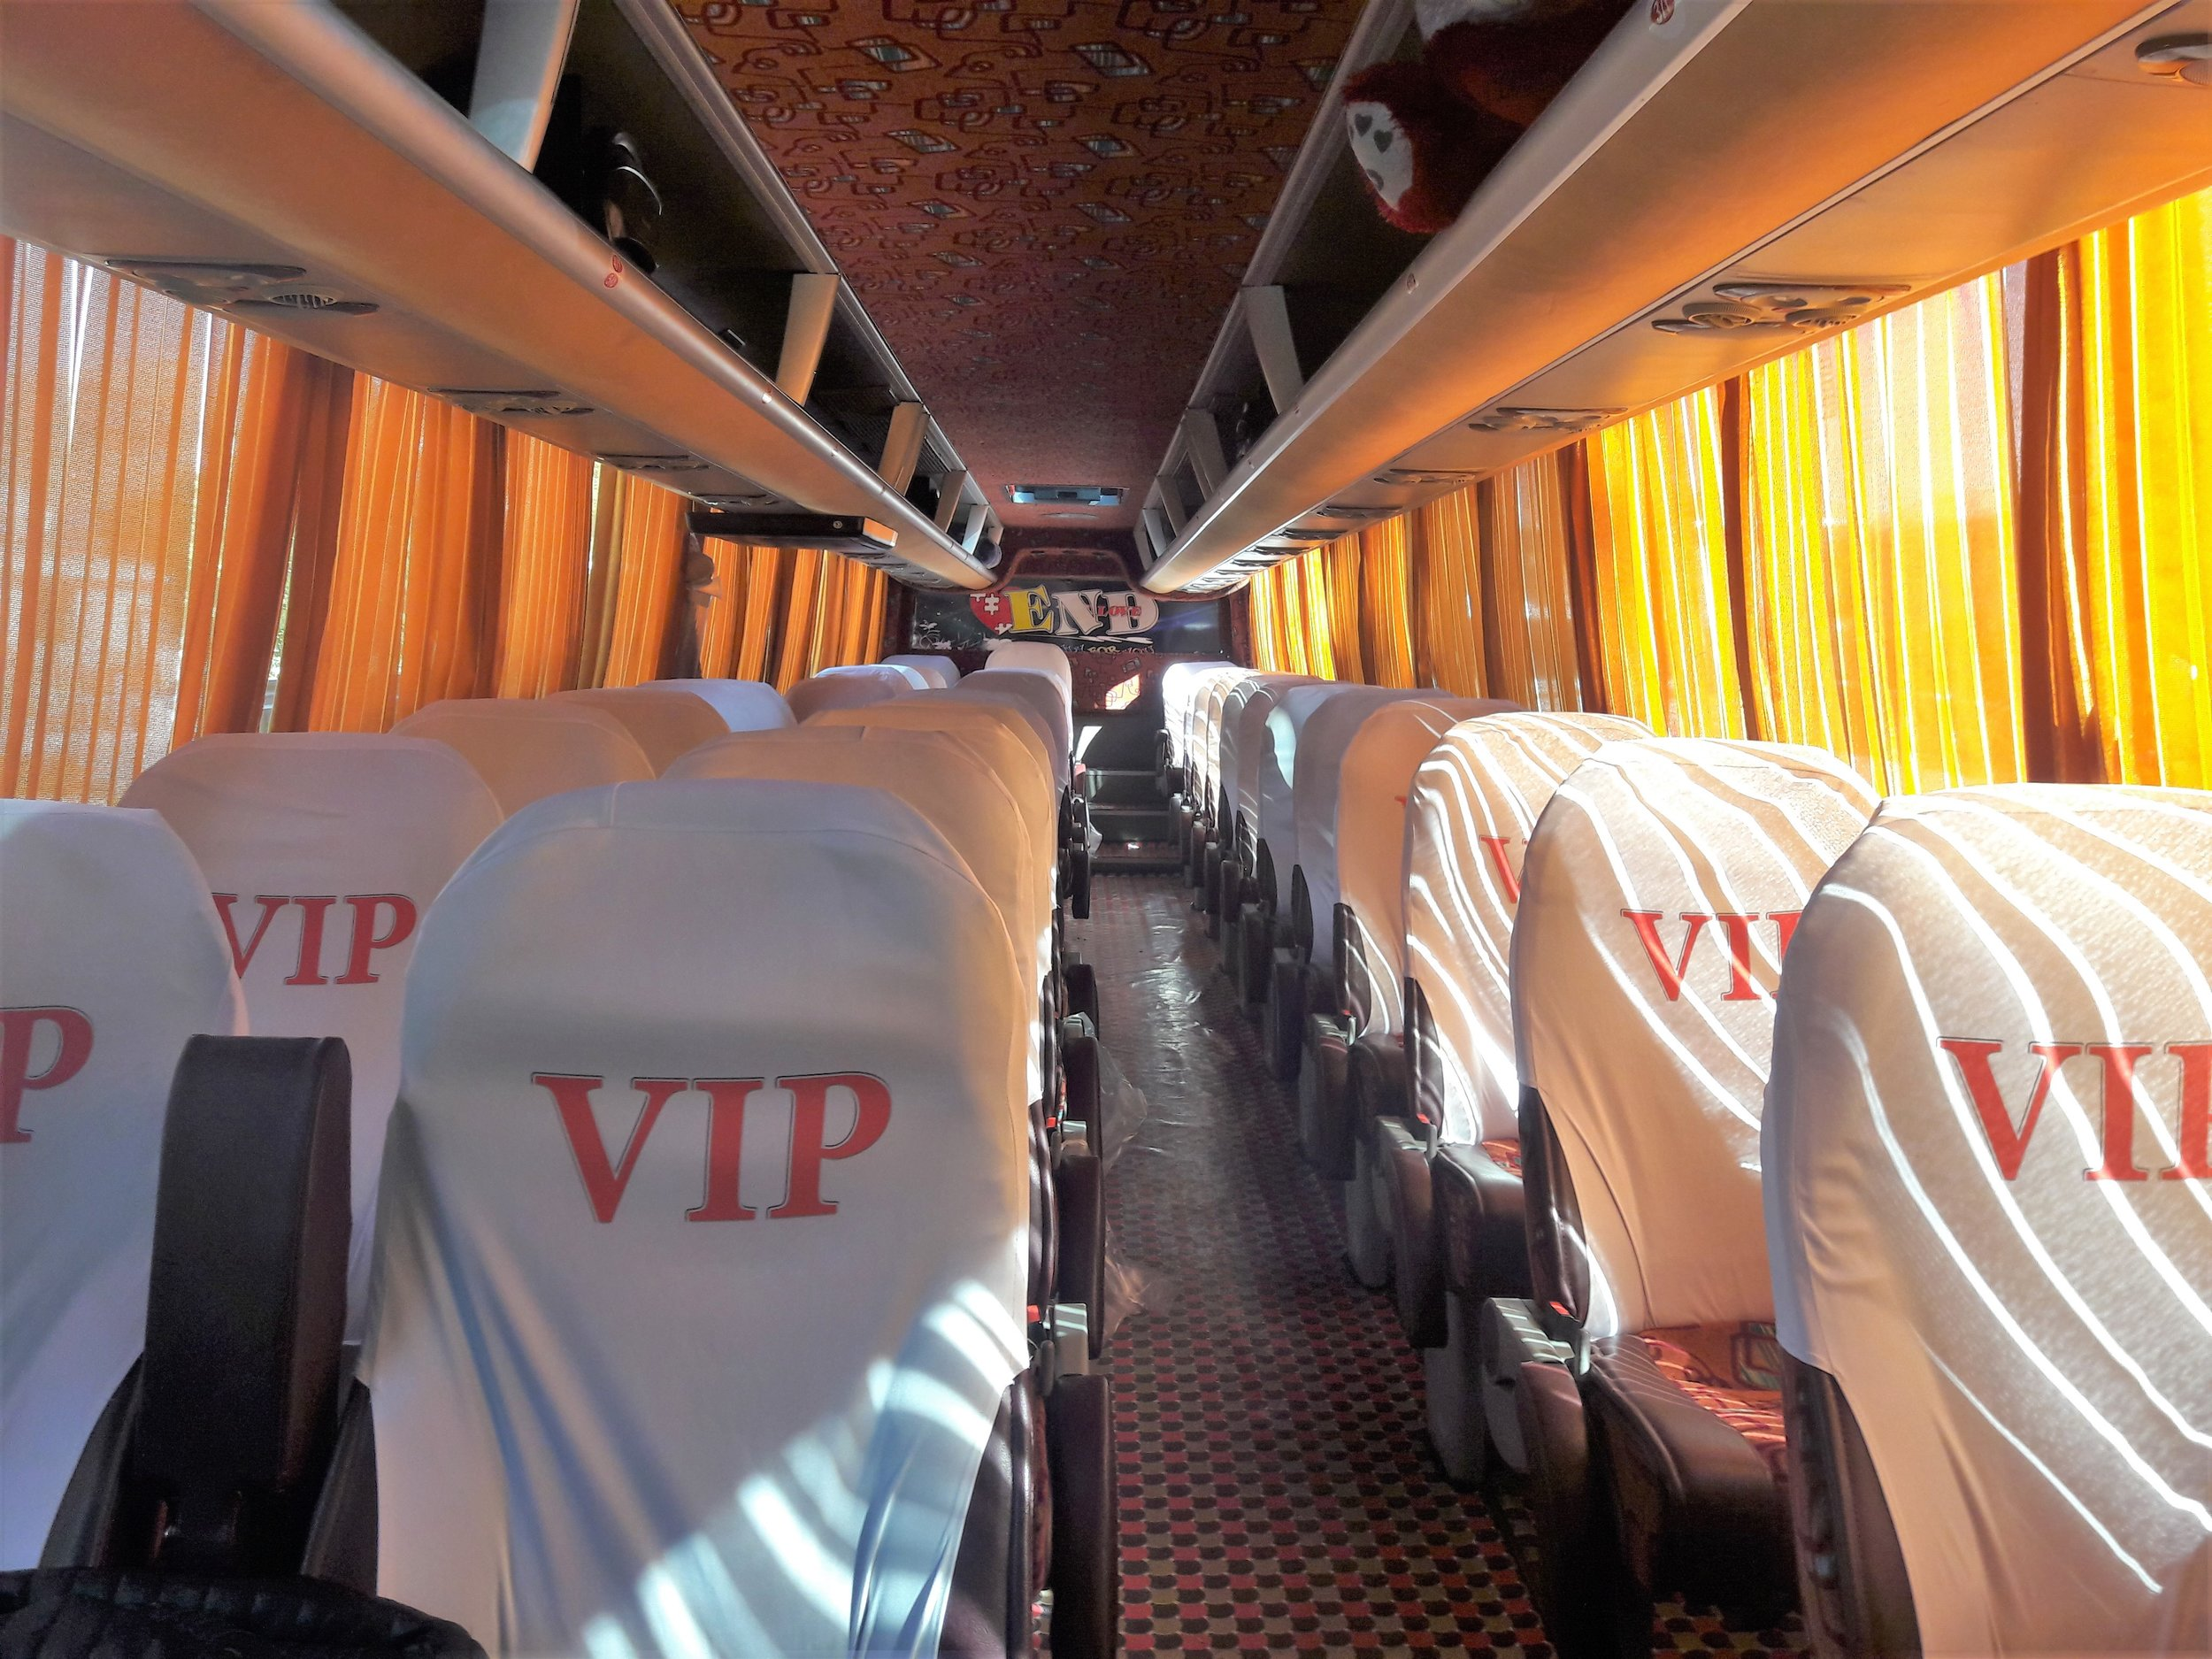 VIP buses Iran.jpg